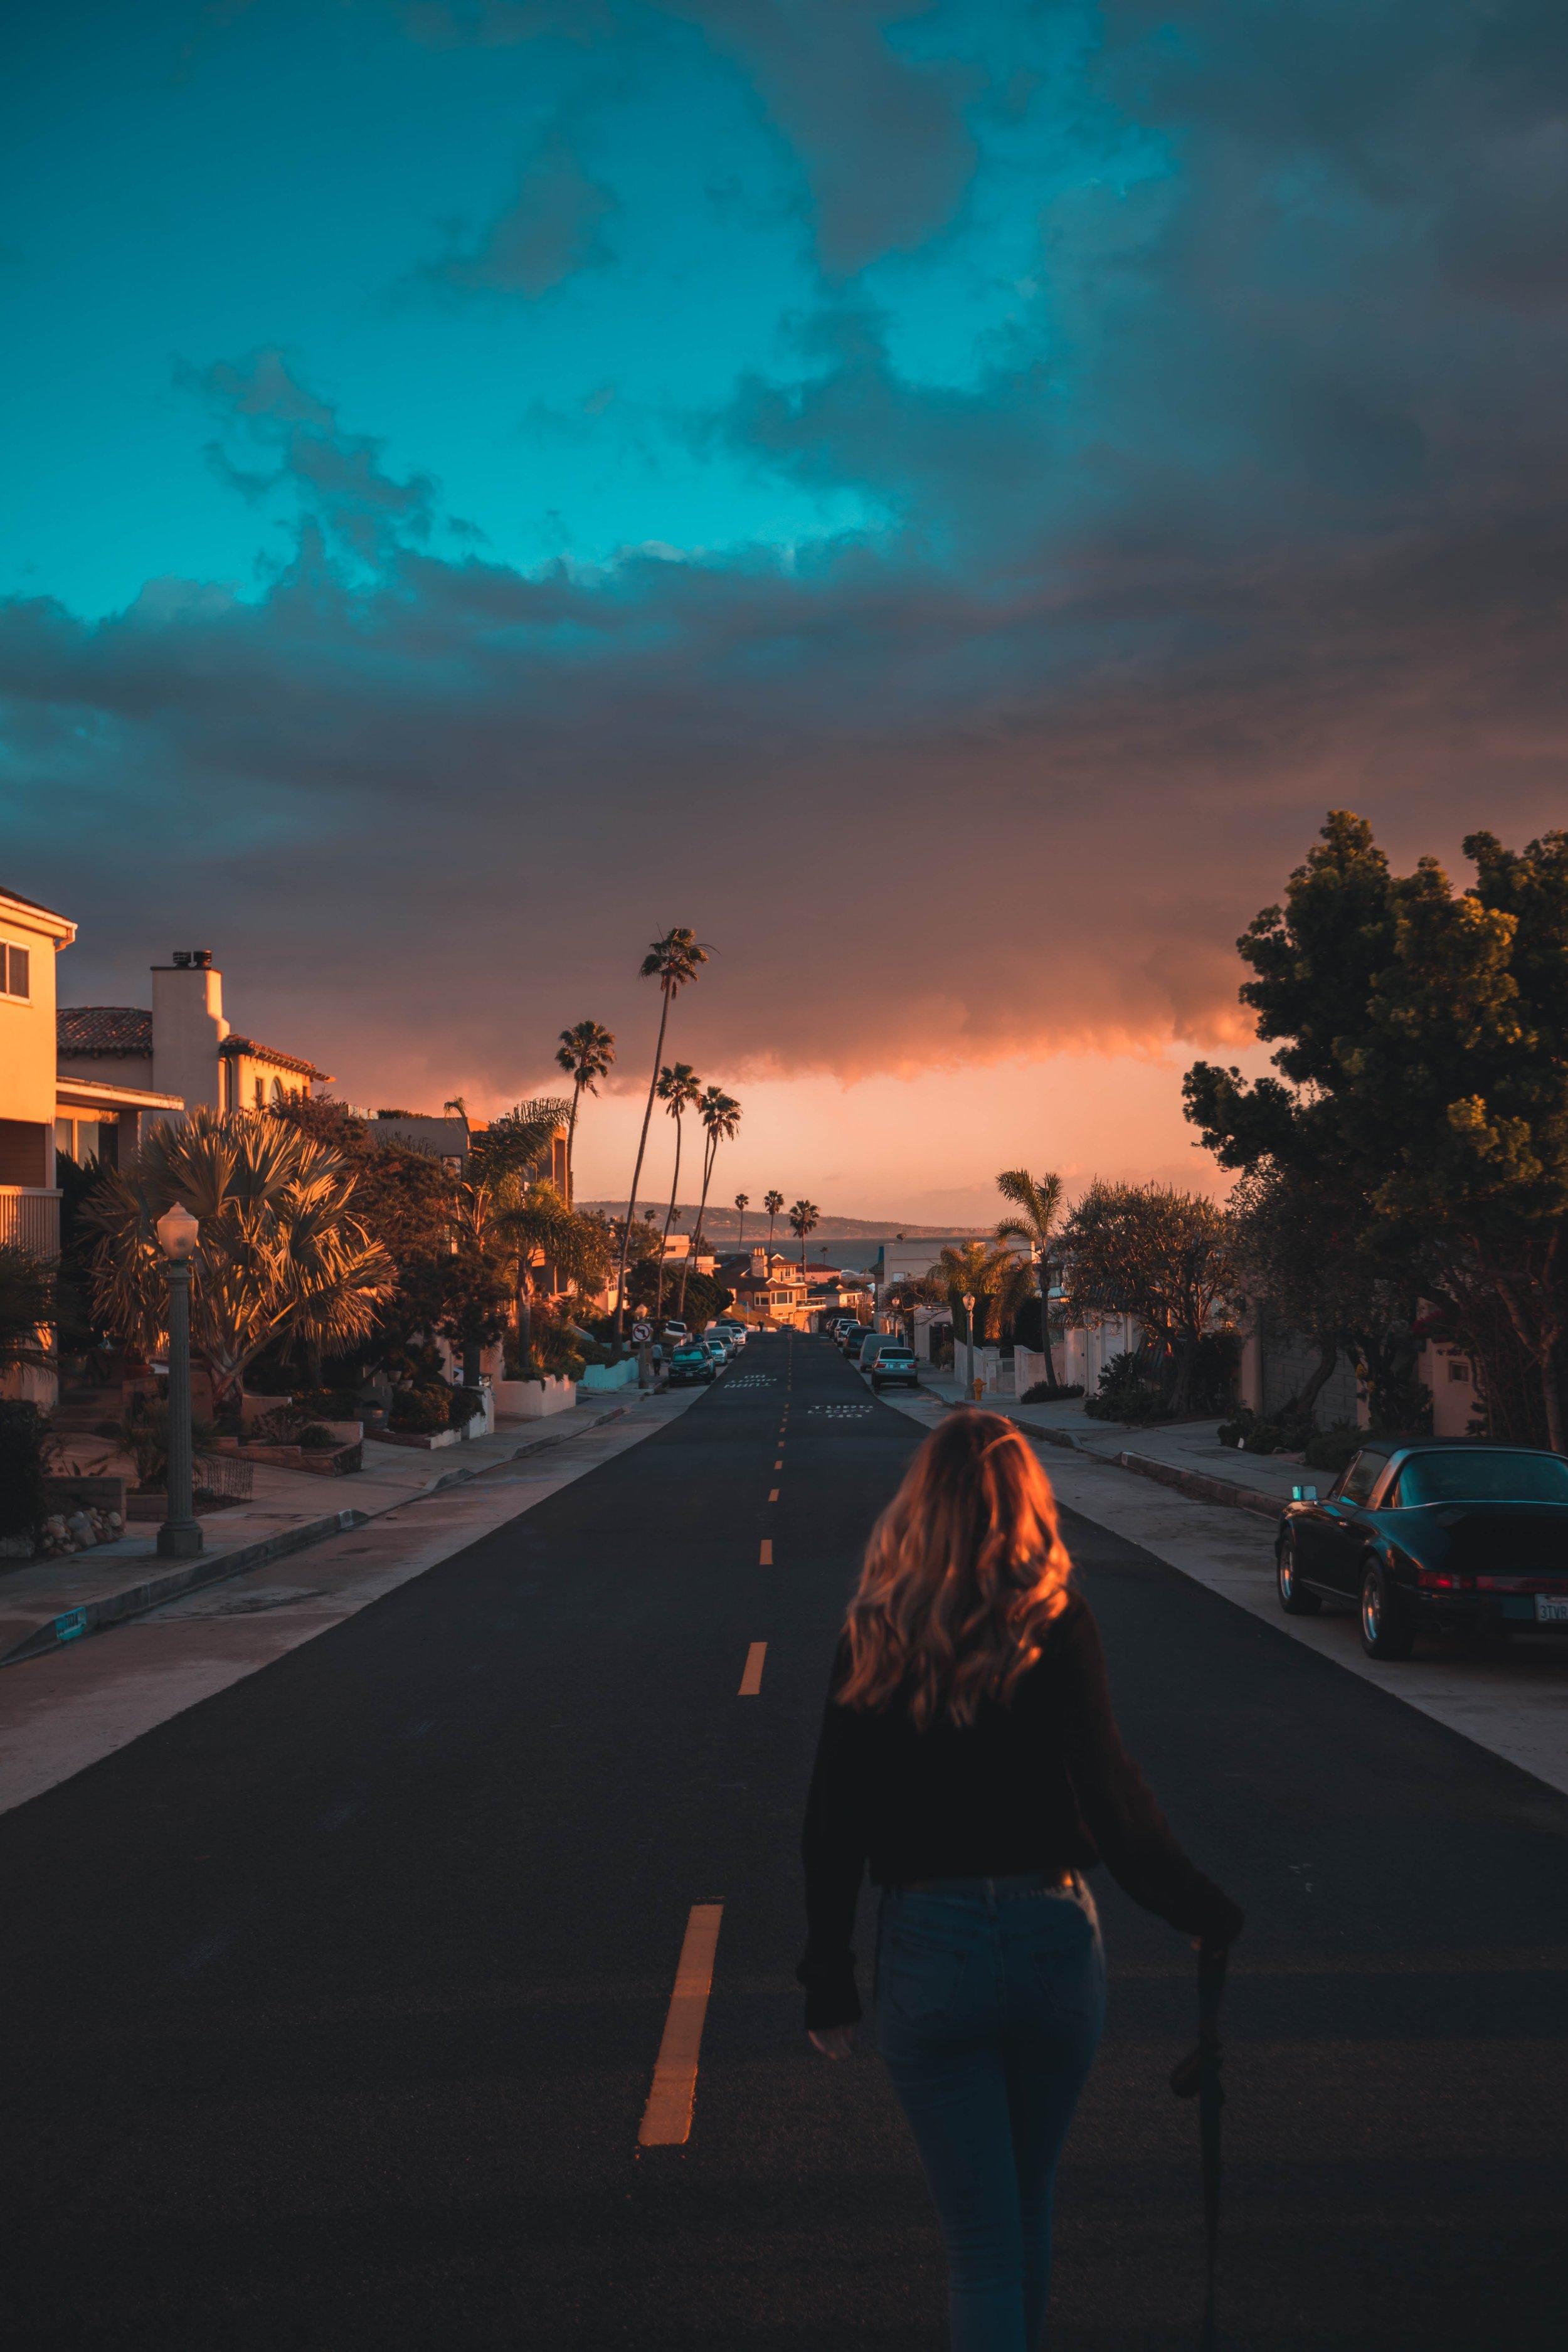 cali-california-dawn-2631612.jpg